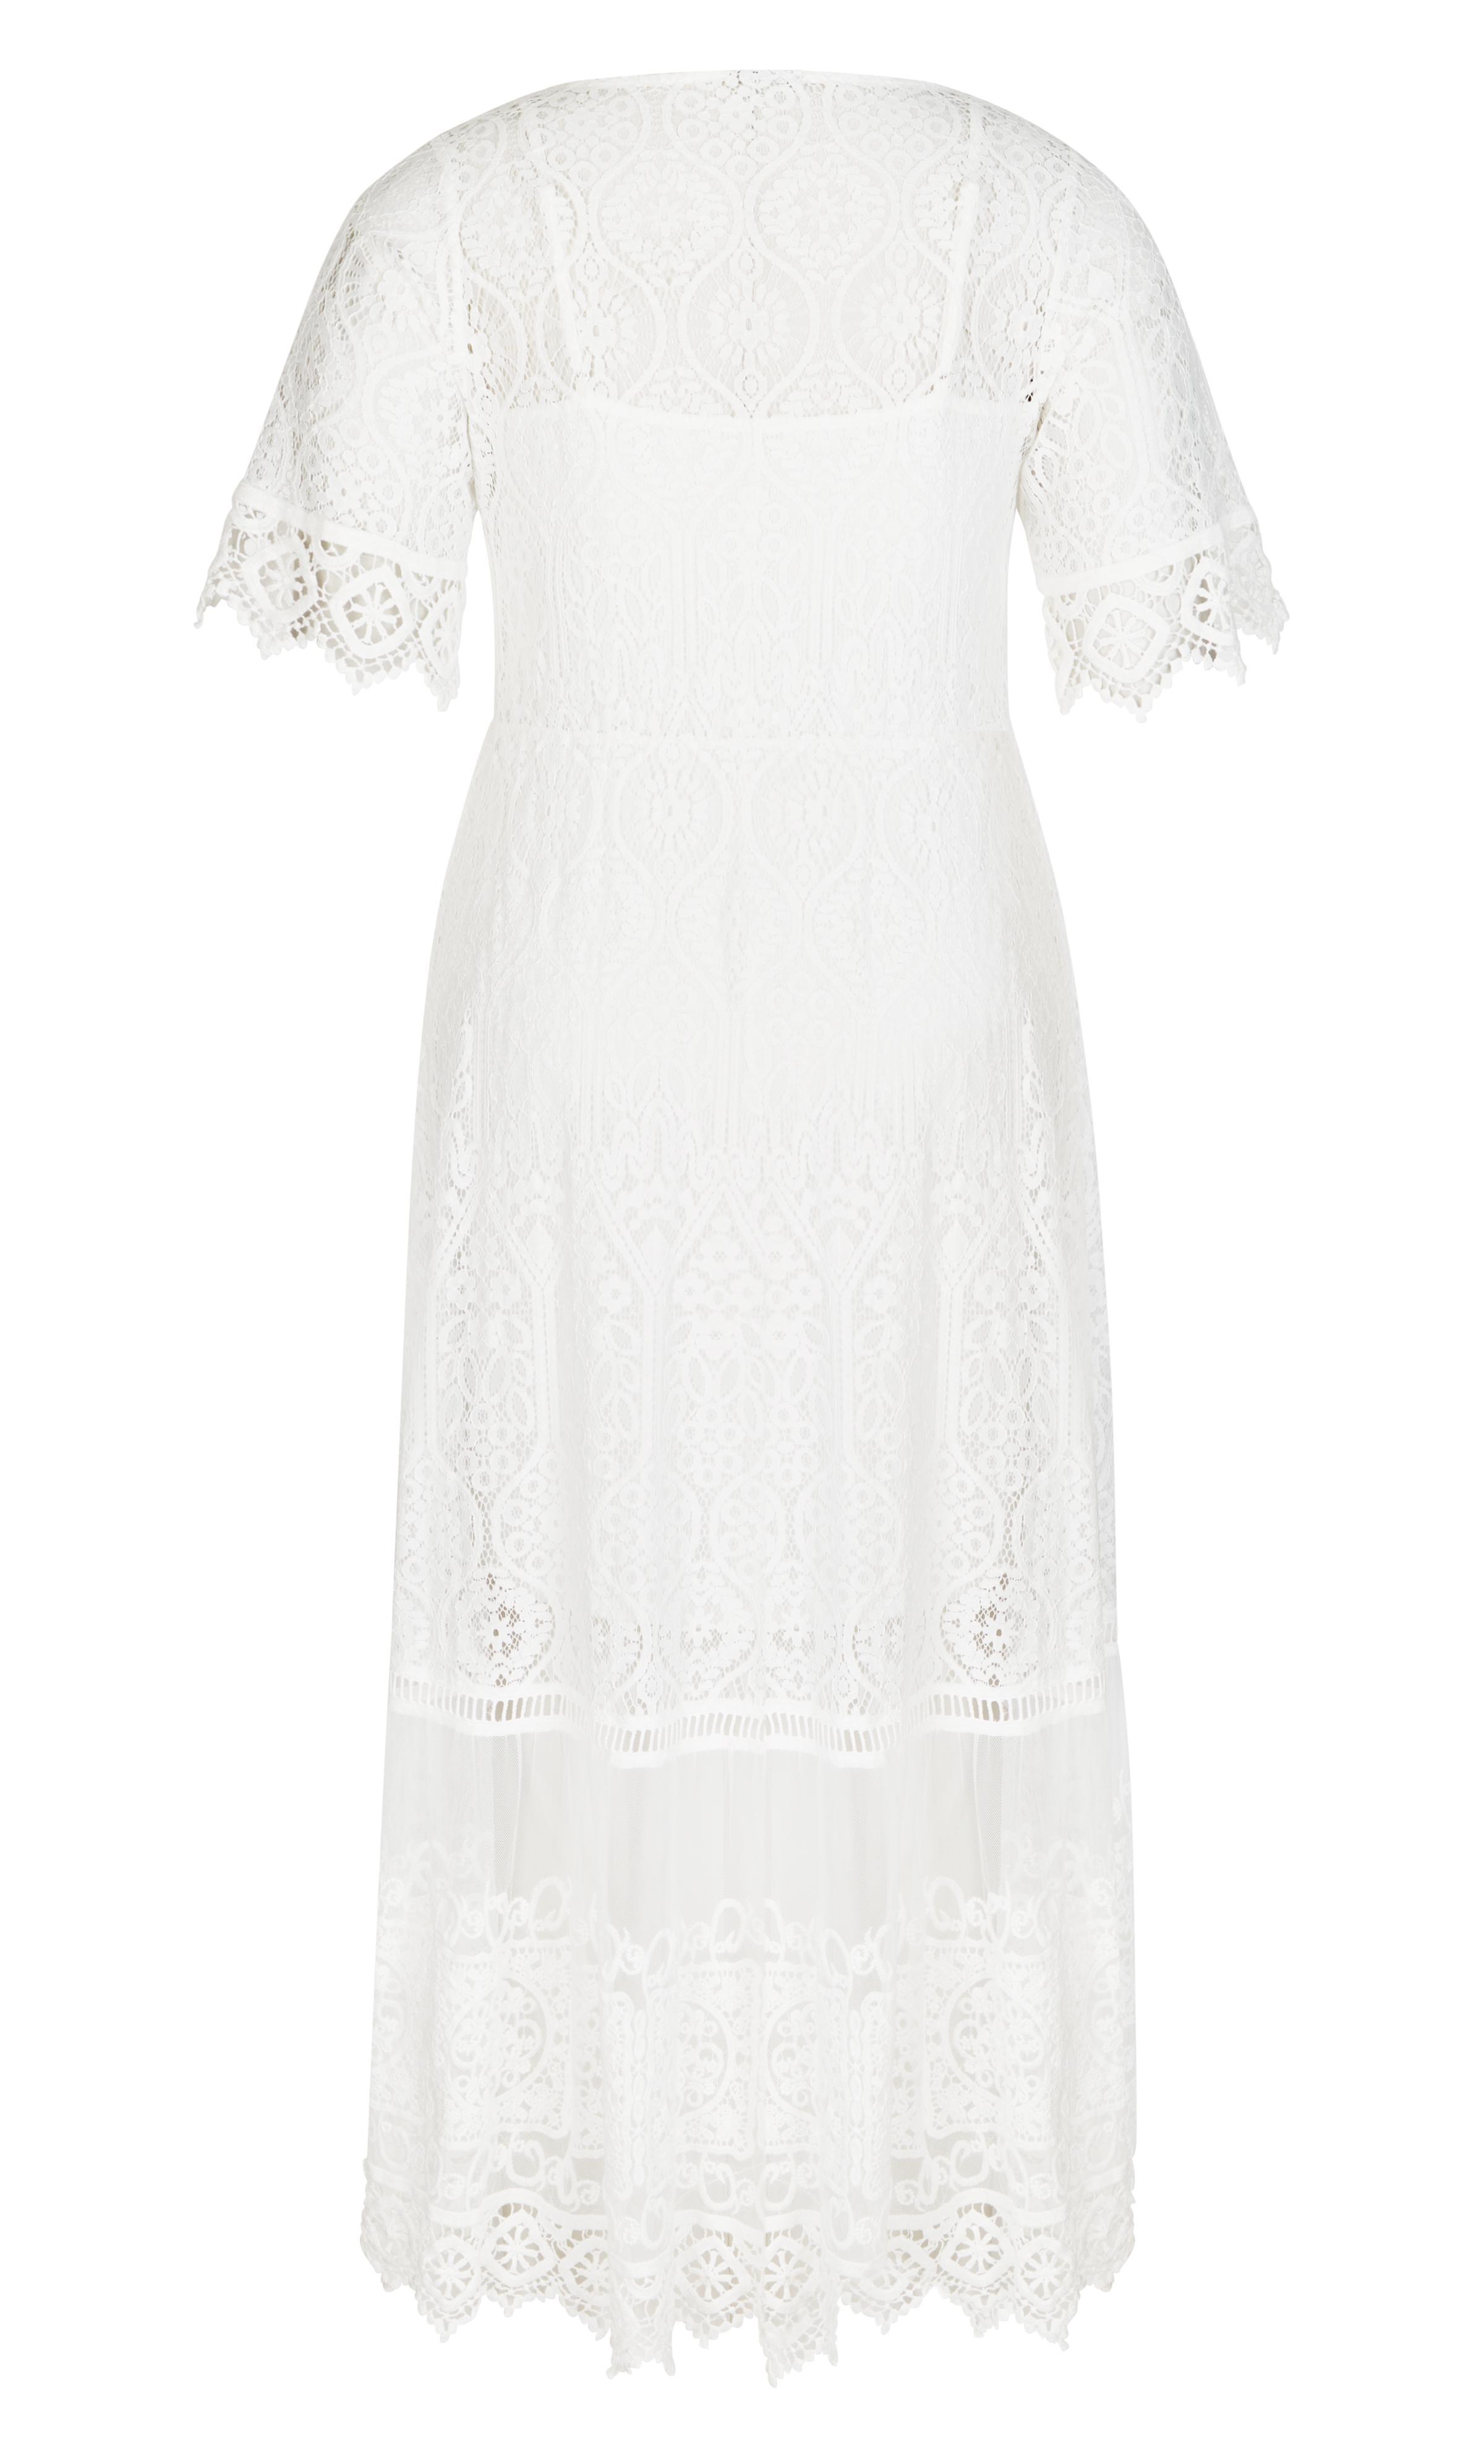 c0b125130b56 City Chic - White Ivory Summer Lace Maxi Dress - Lyst. View fullscreen